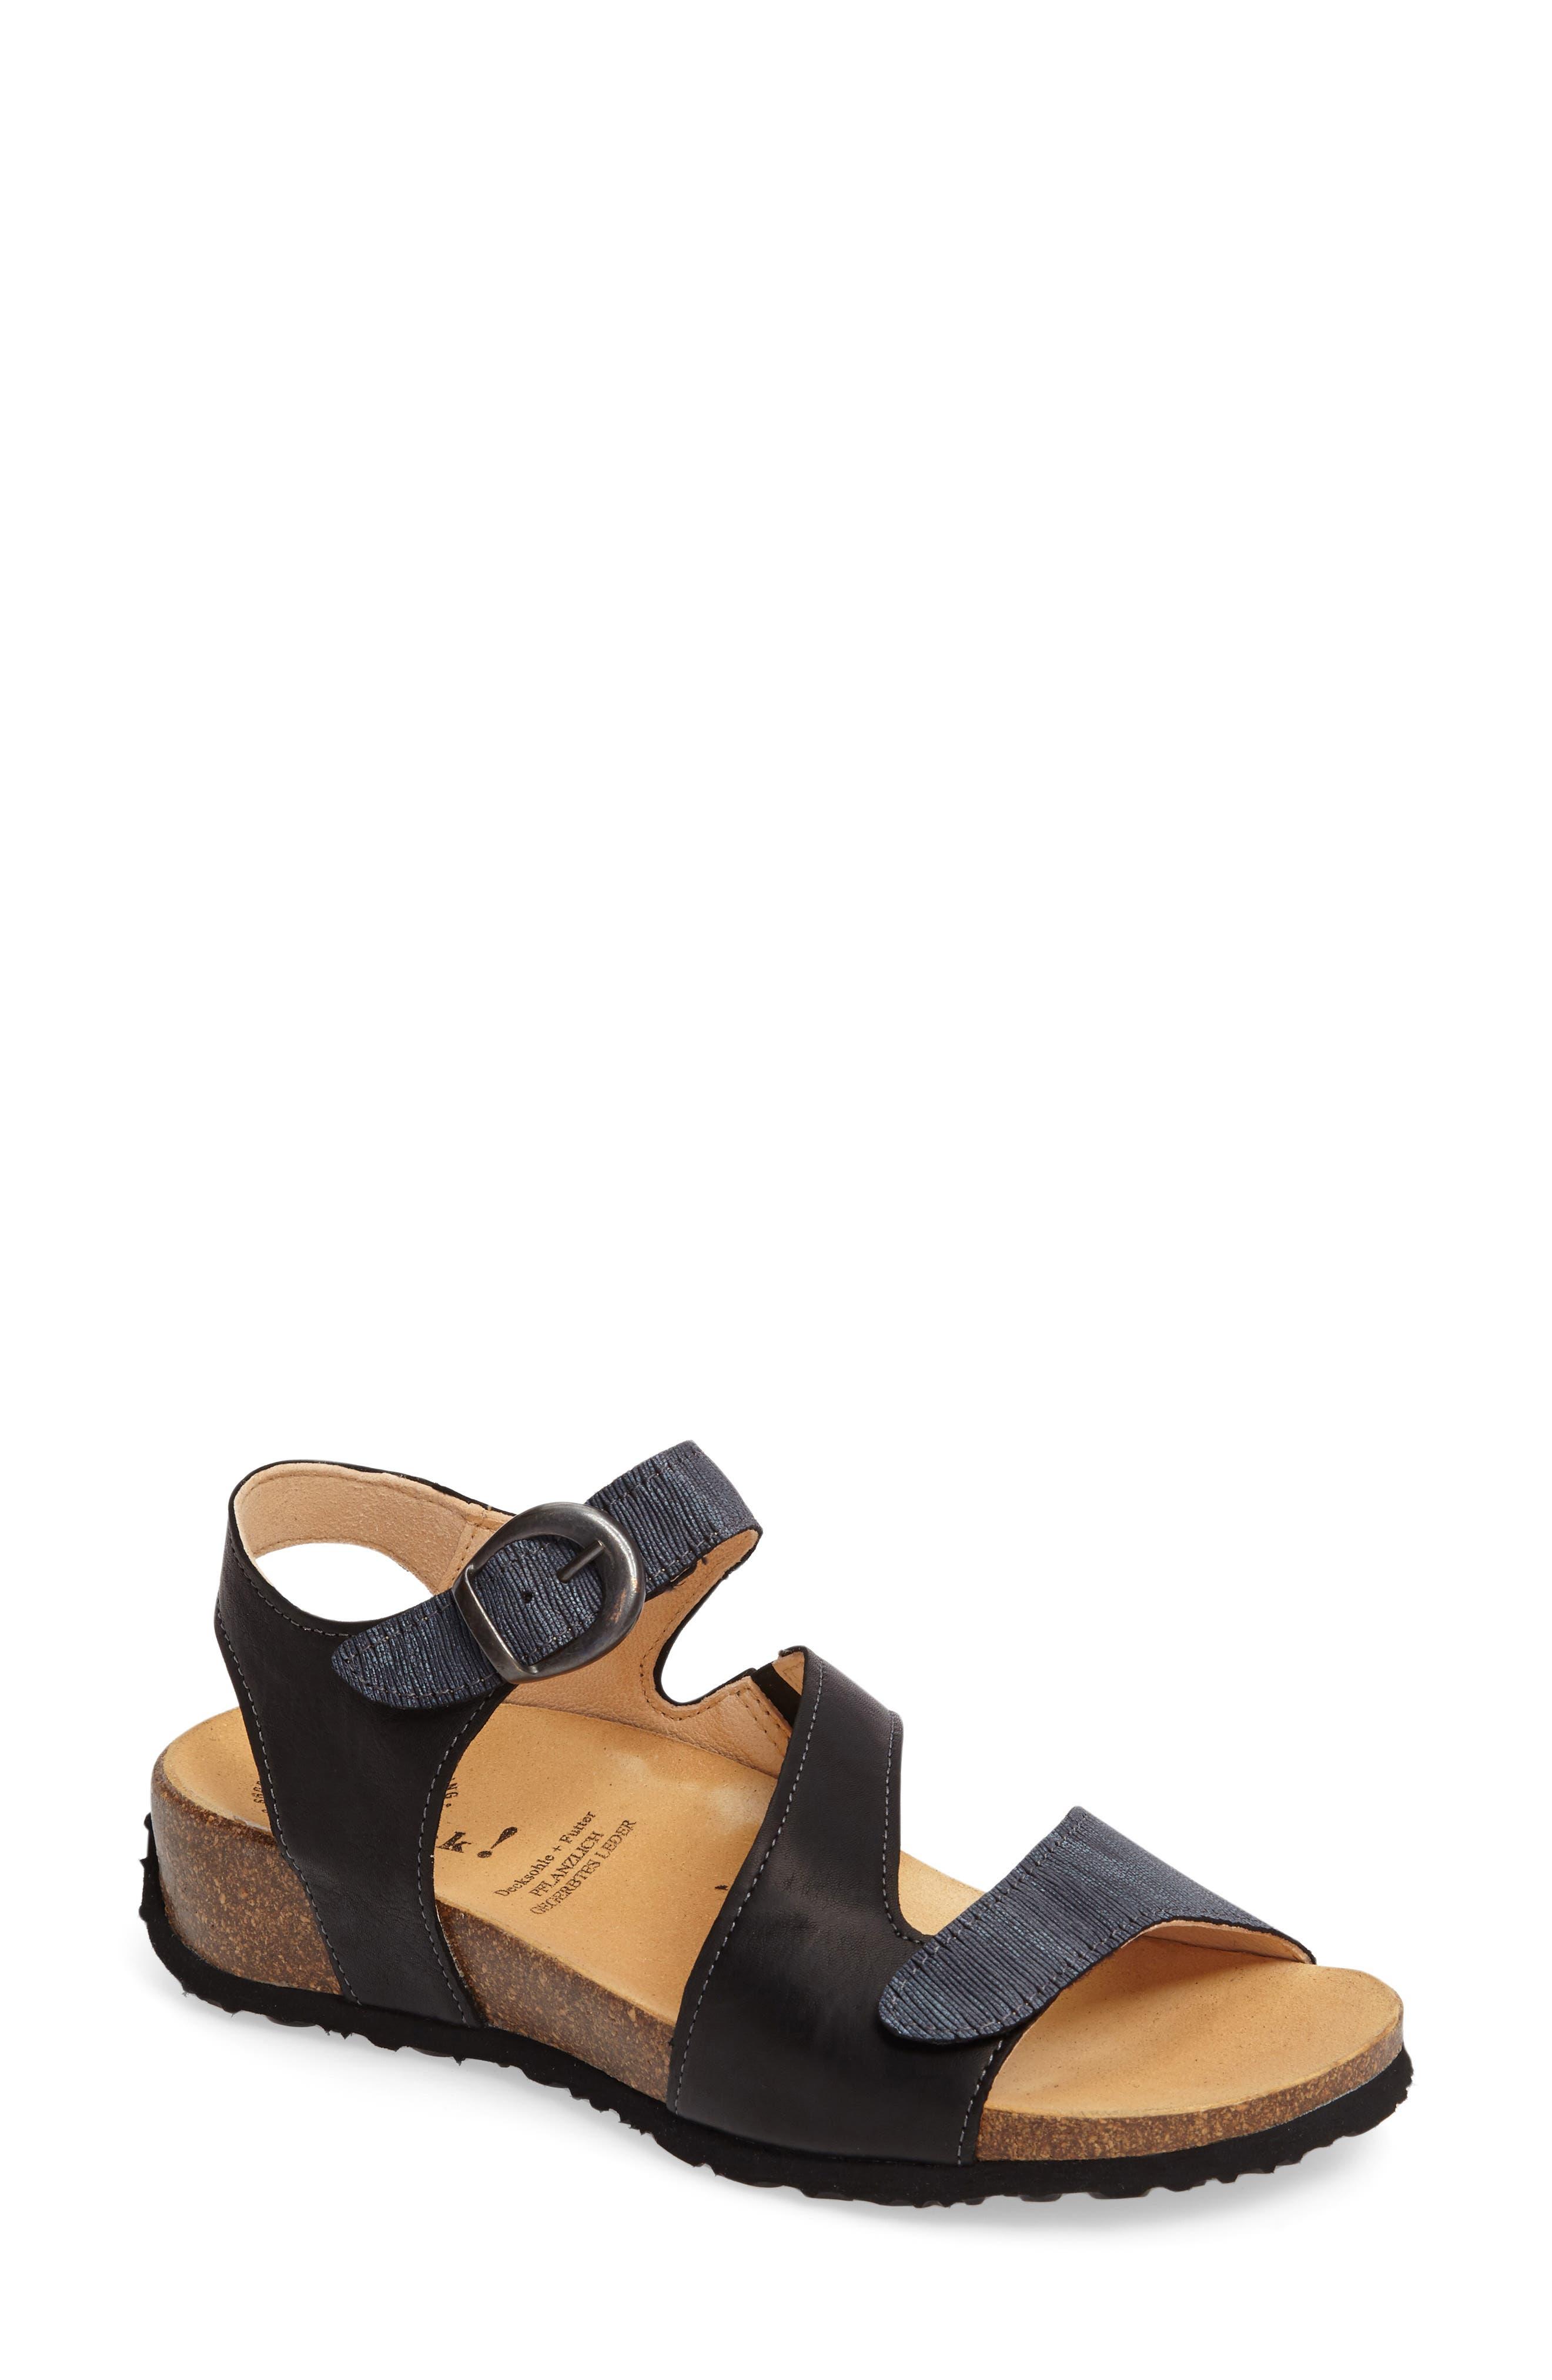 Alternate Image 1 Selected - Think! Mizzi Sandal (Women)